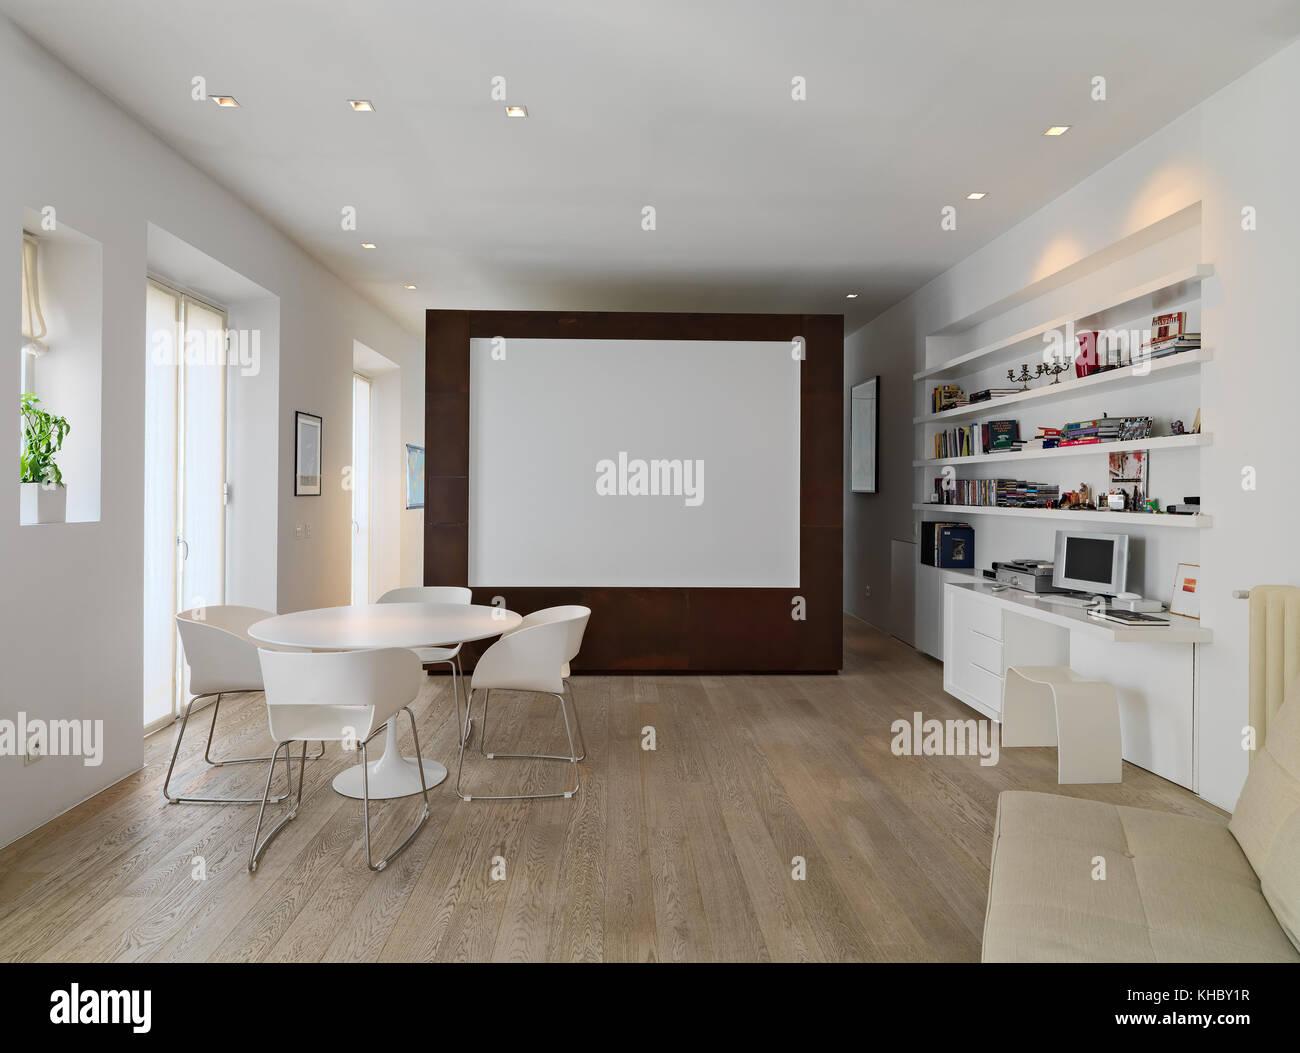 Fotograf as de interiores de una moderna sala de estar en for Mesa de comedor en la sala de estar